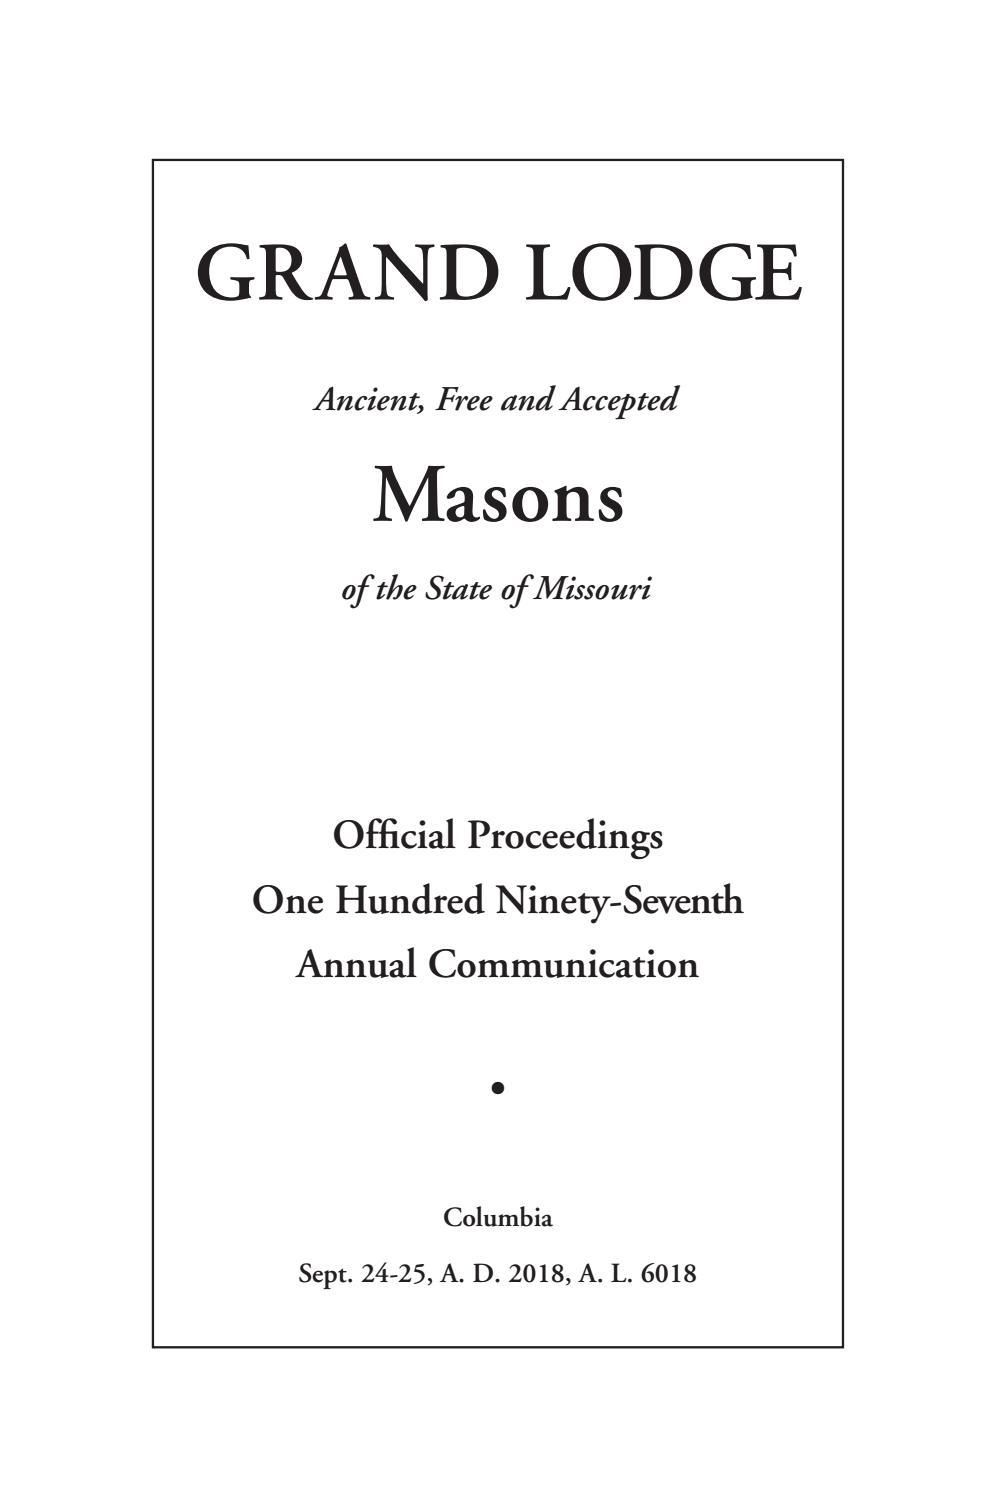 Official Proceedings - Grand Lodge Mo Annual Communication In Las Cruces Public School Calendar 2021 20